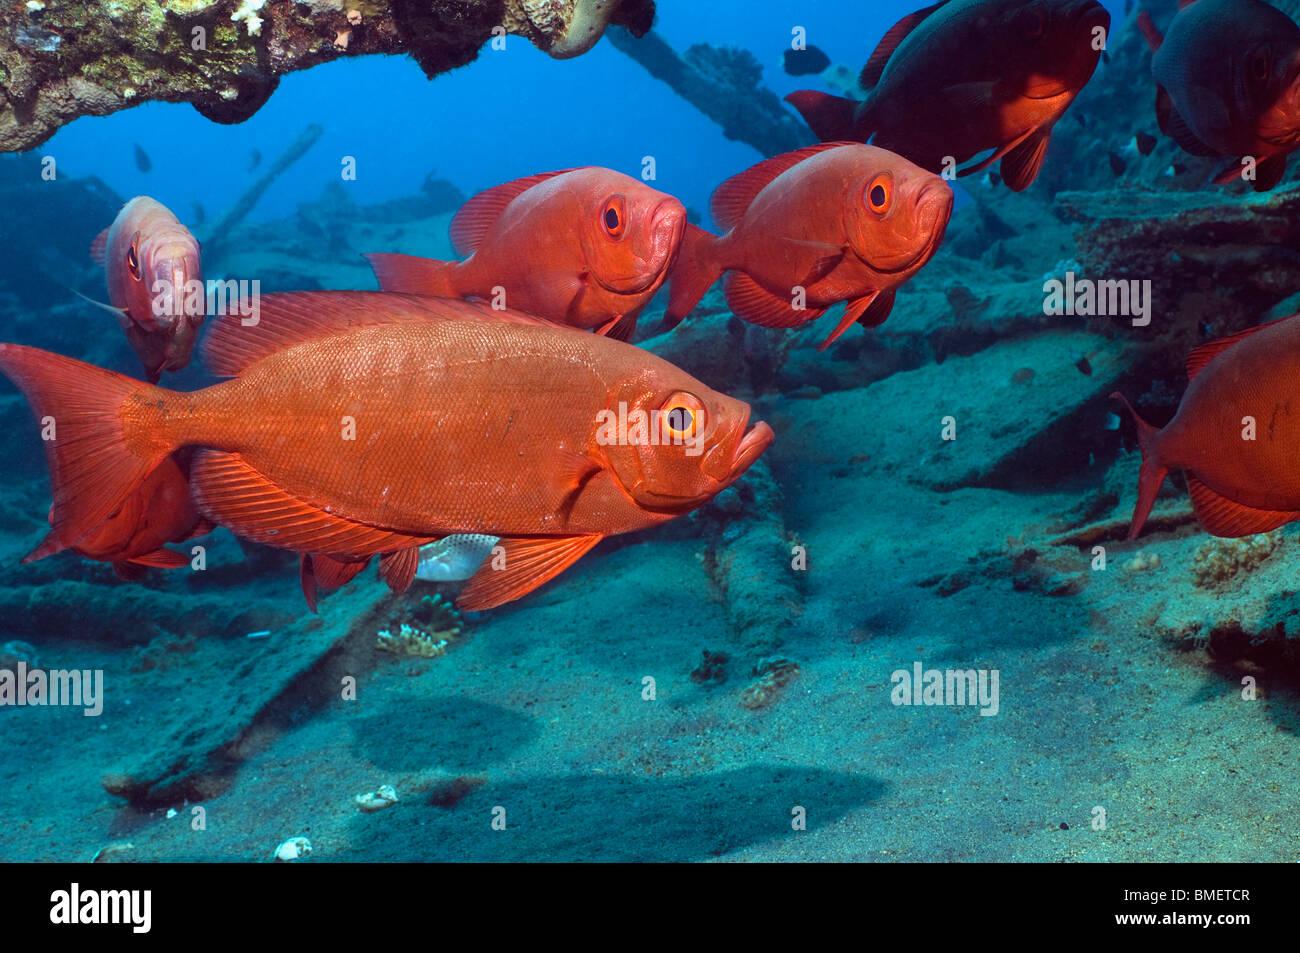 Big-eye ou Goggle-eye sur épave. Mer Rouge, Egypte. Photo Stock